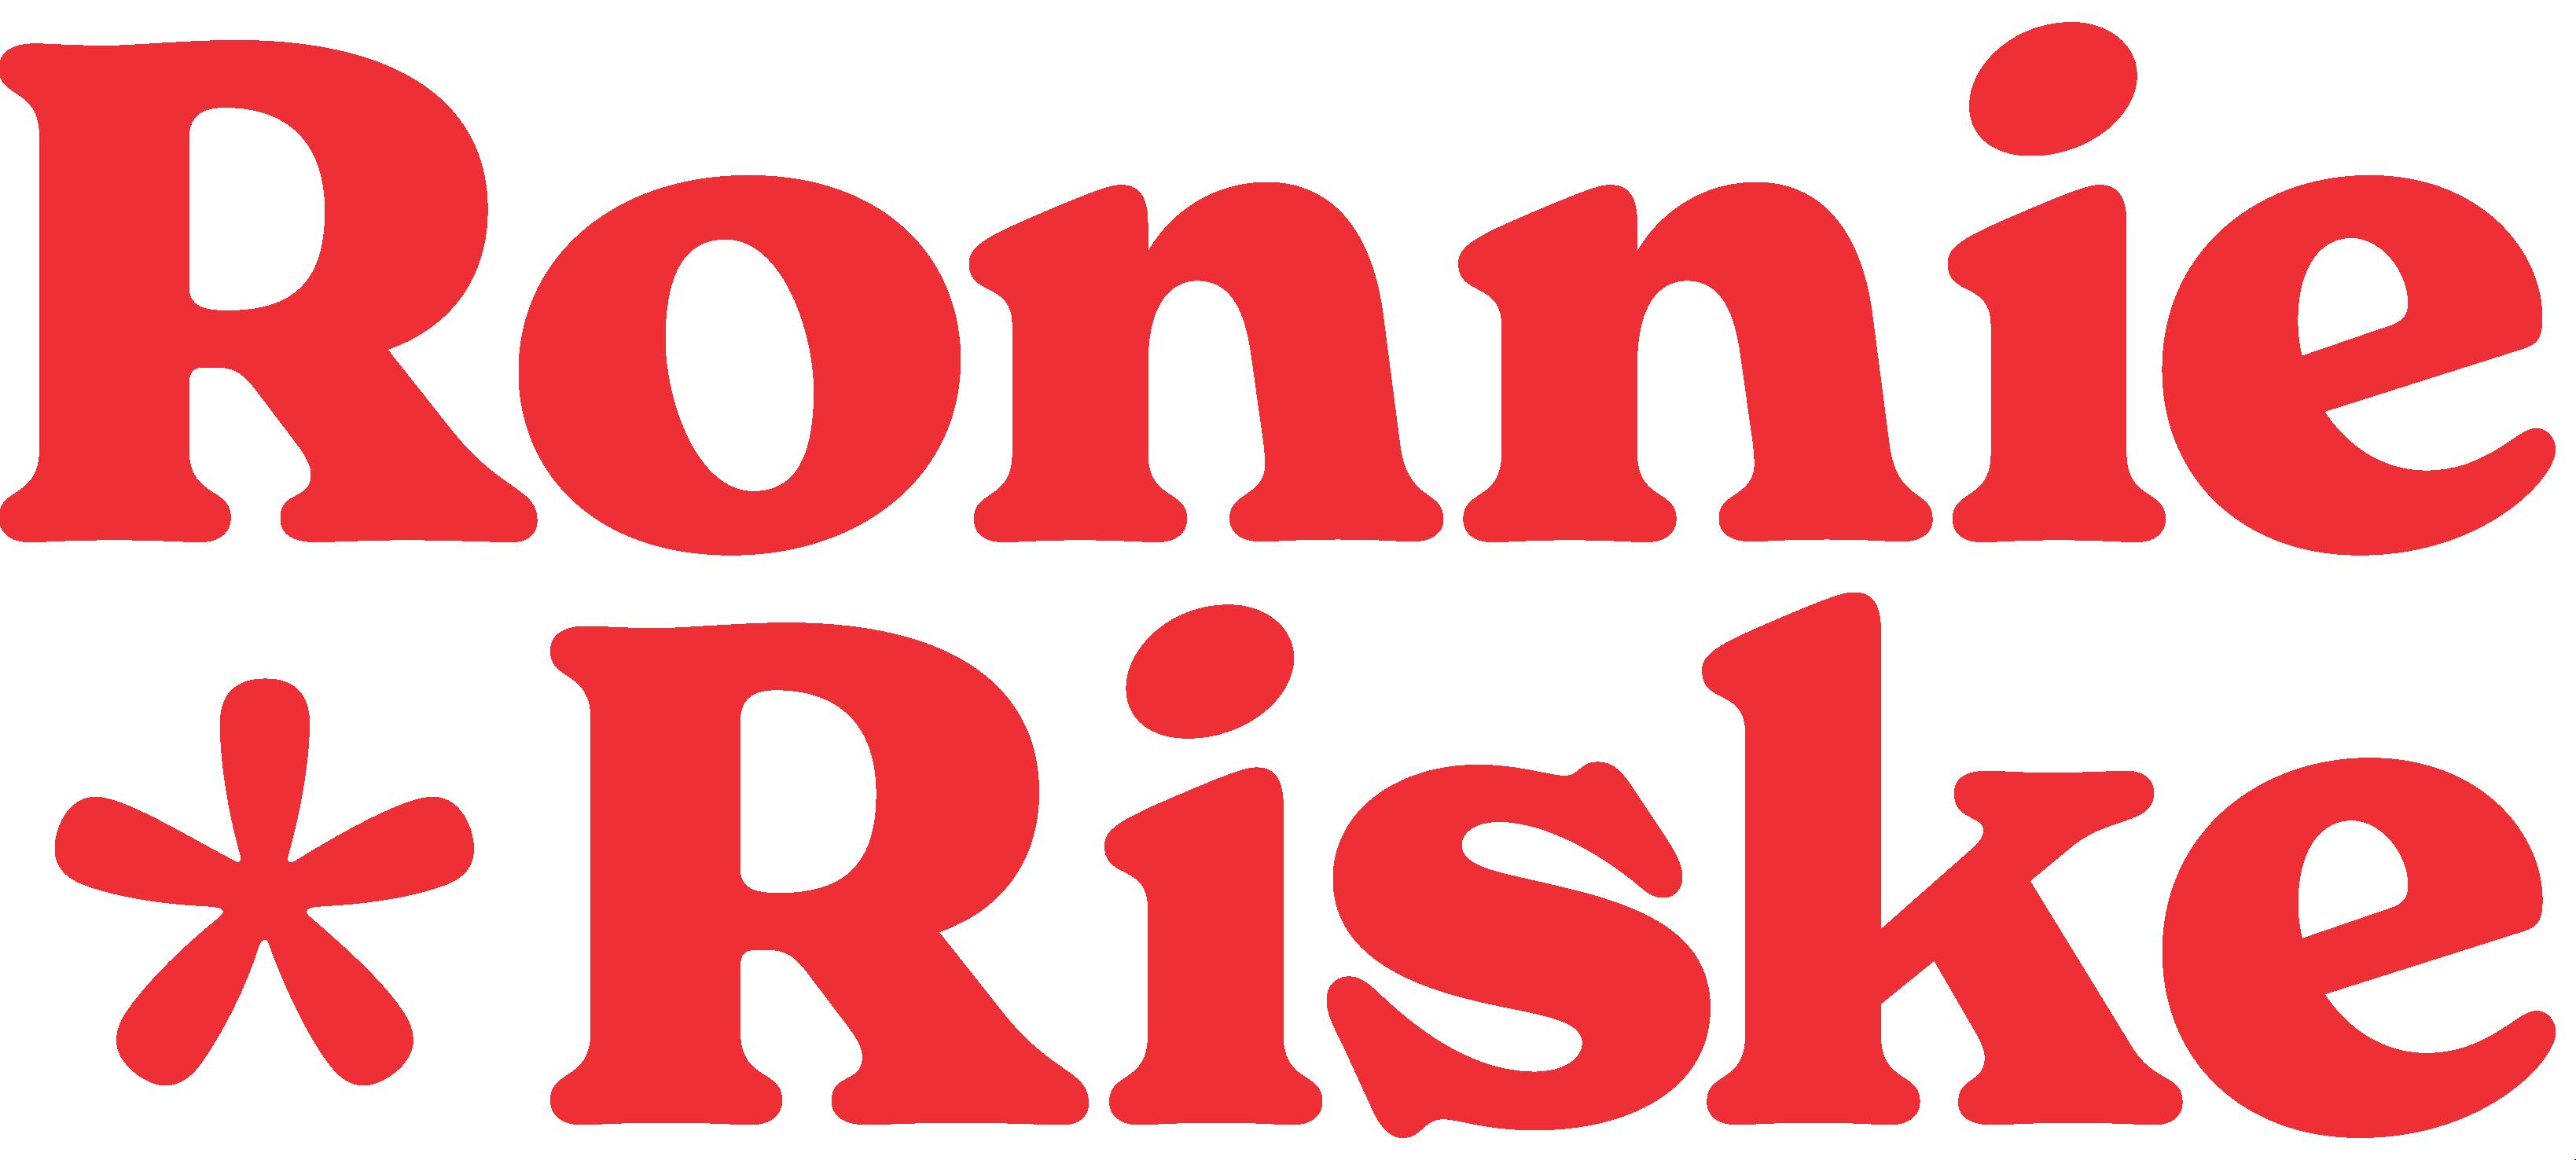 Ronnie Riske